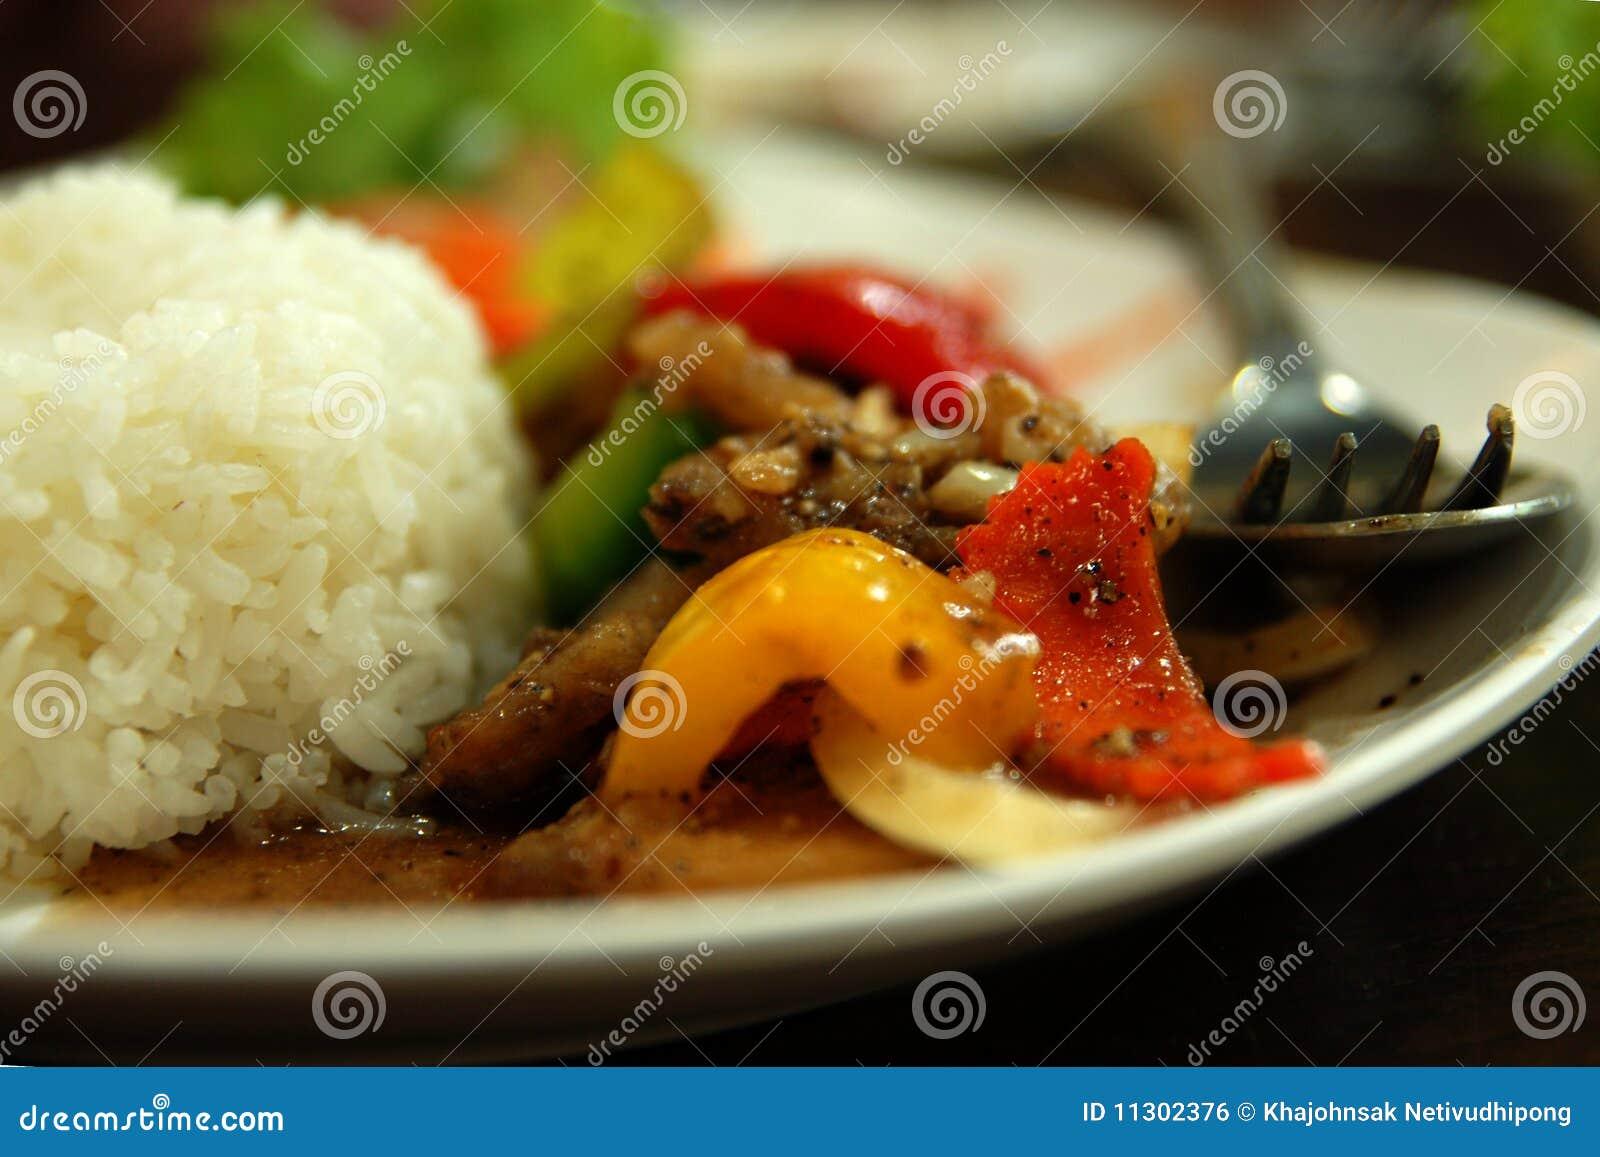 Siamesische Mahlzeit